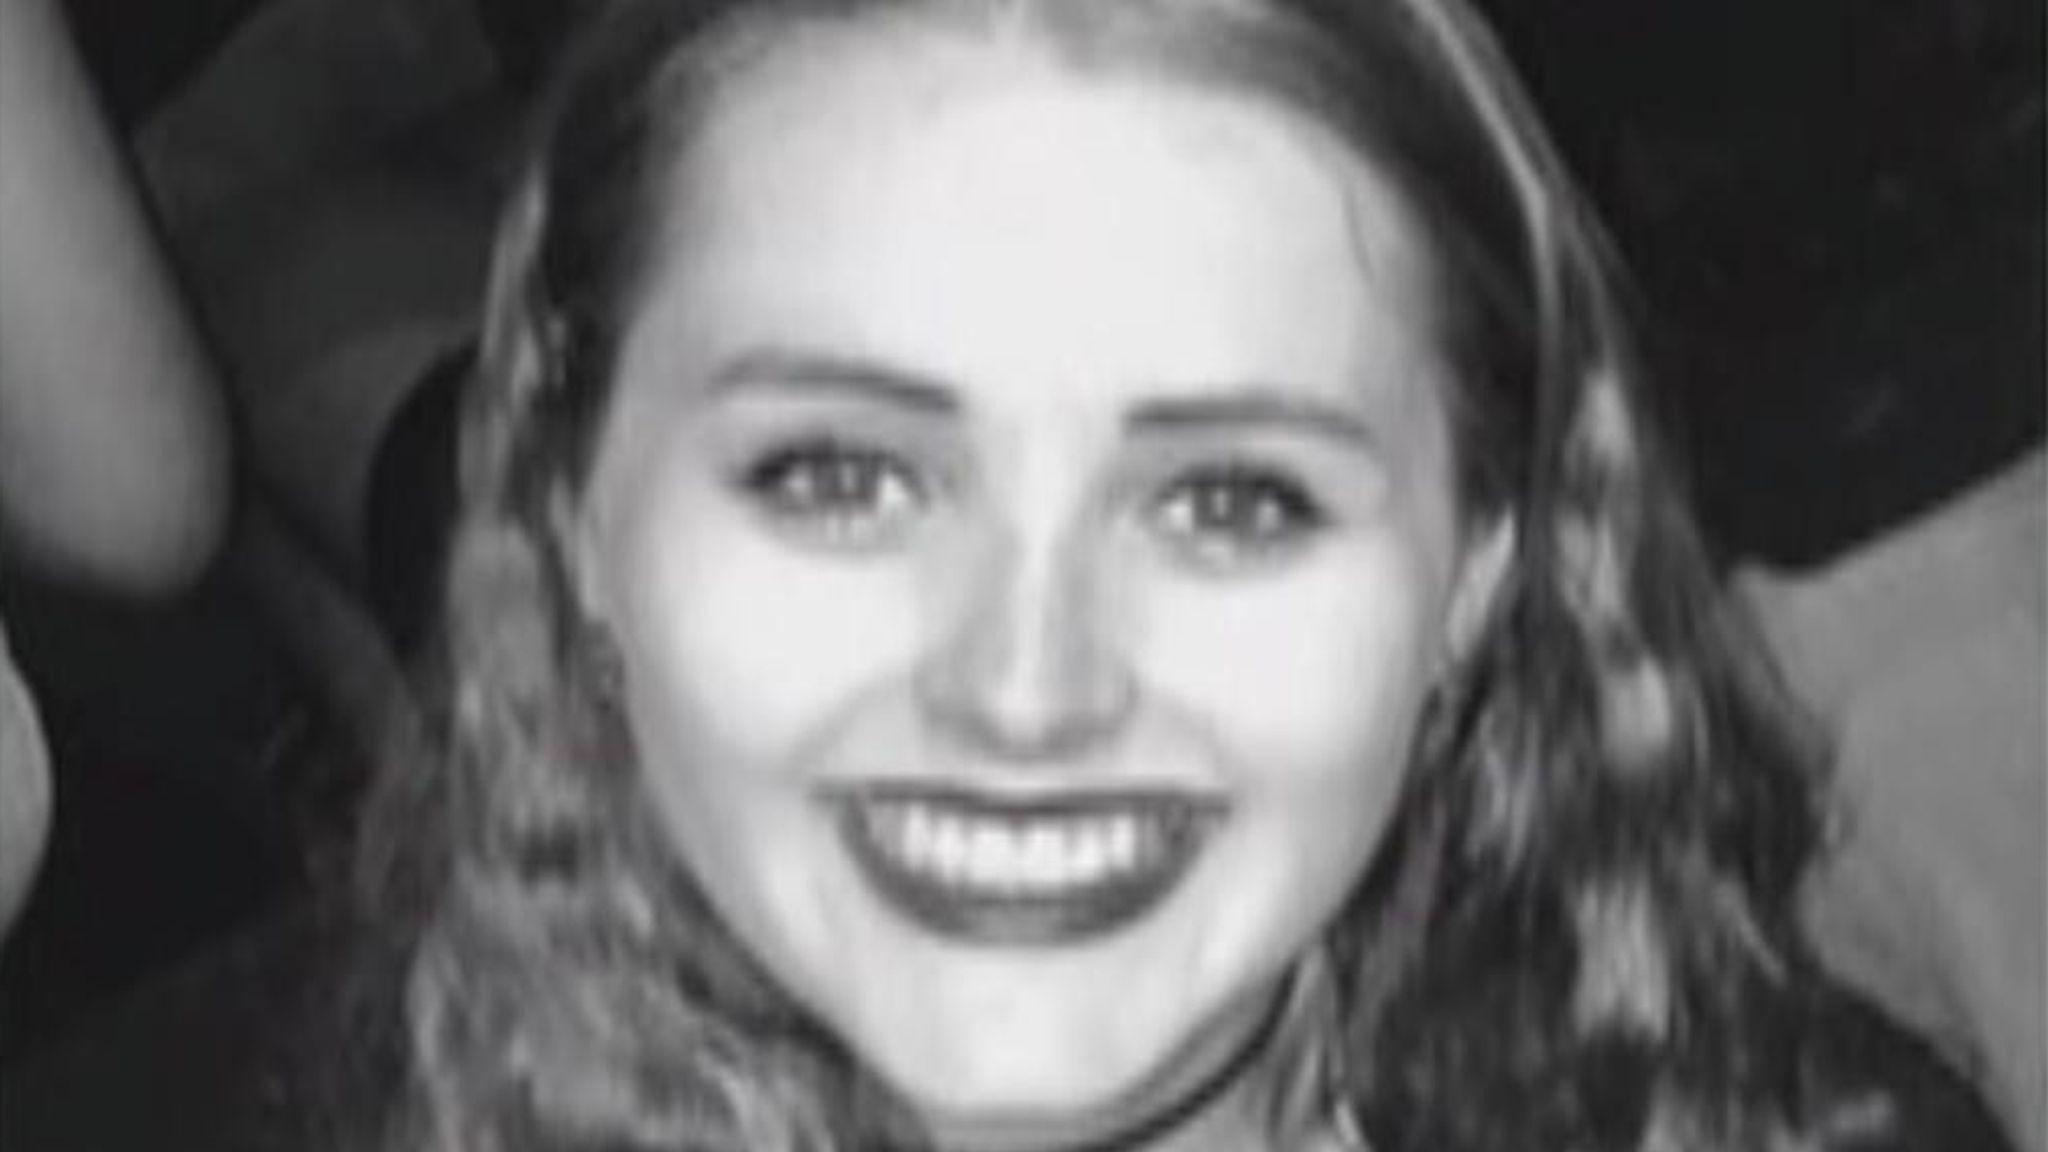 Grace Millane murdered by man 'seeking total domination', court hears